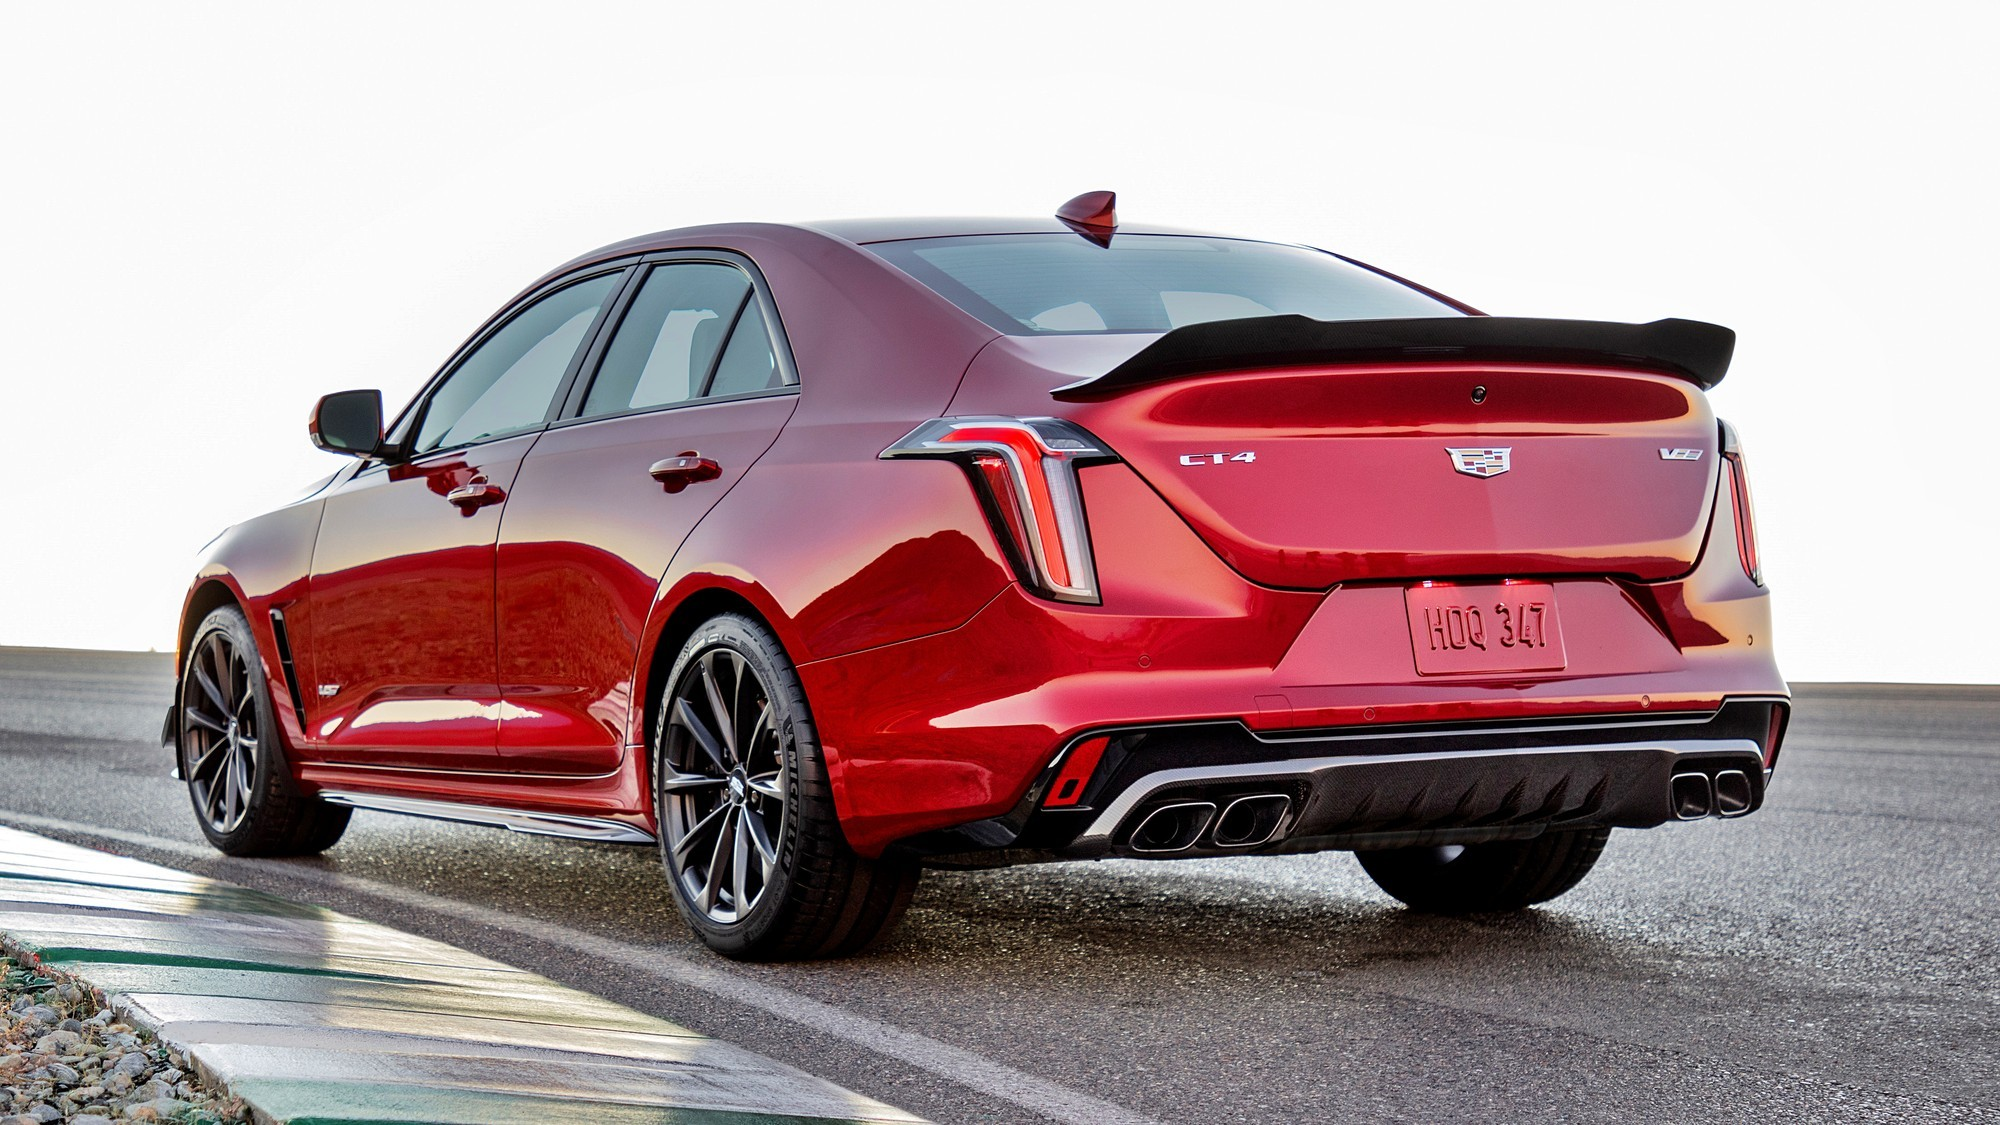 Допинг для аутсайдера: представлен Cadillac CT4-V Blackwing с 479-сильным V6